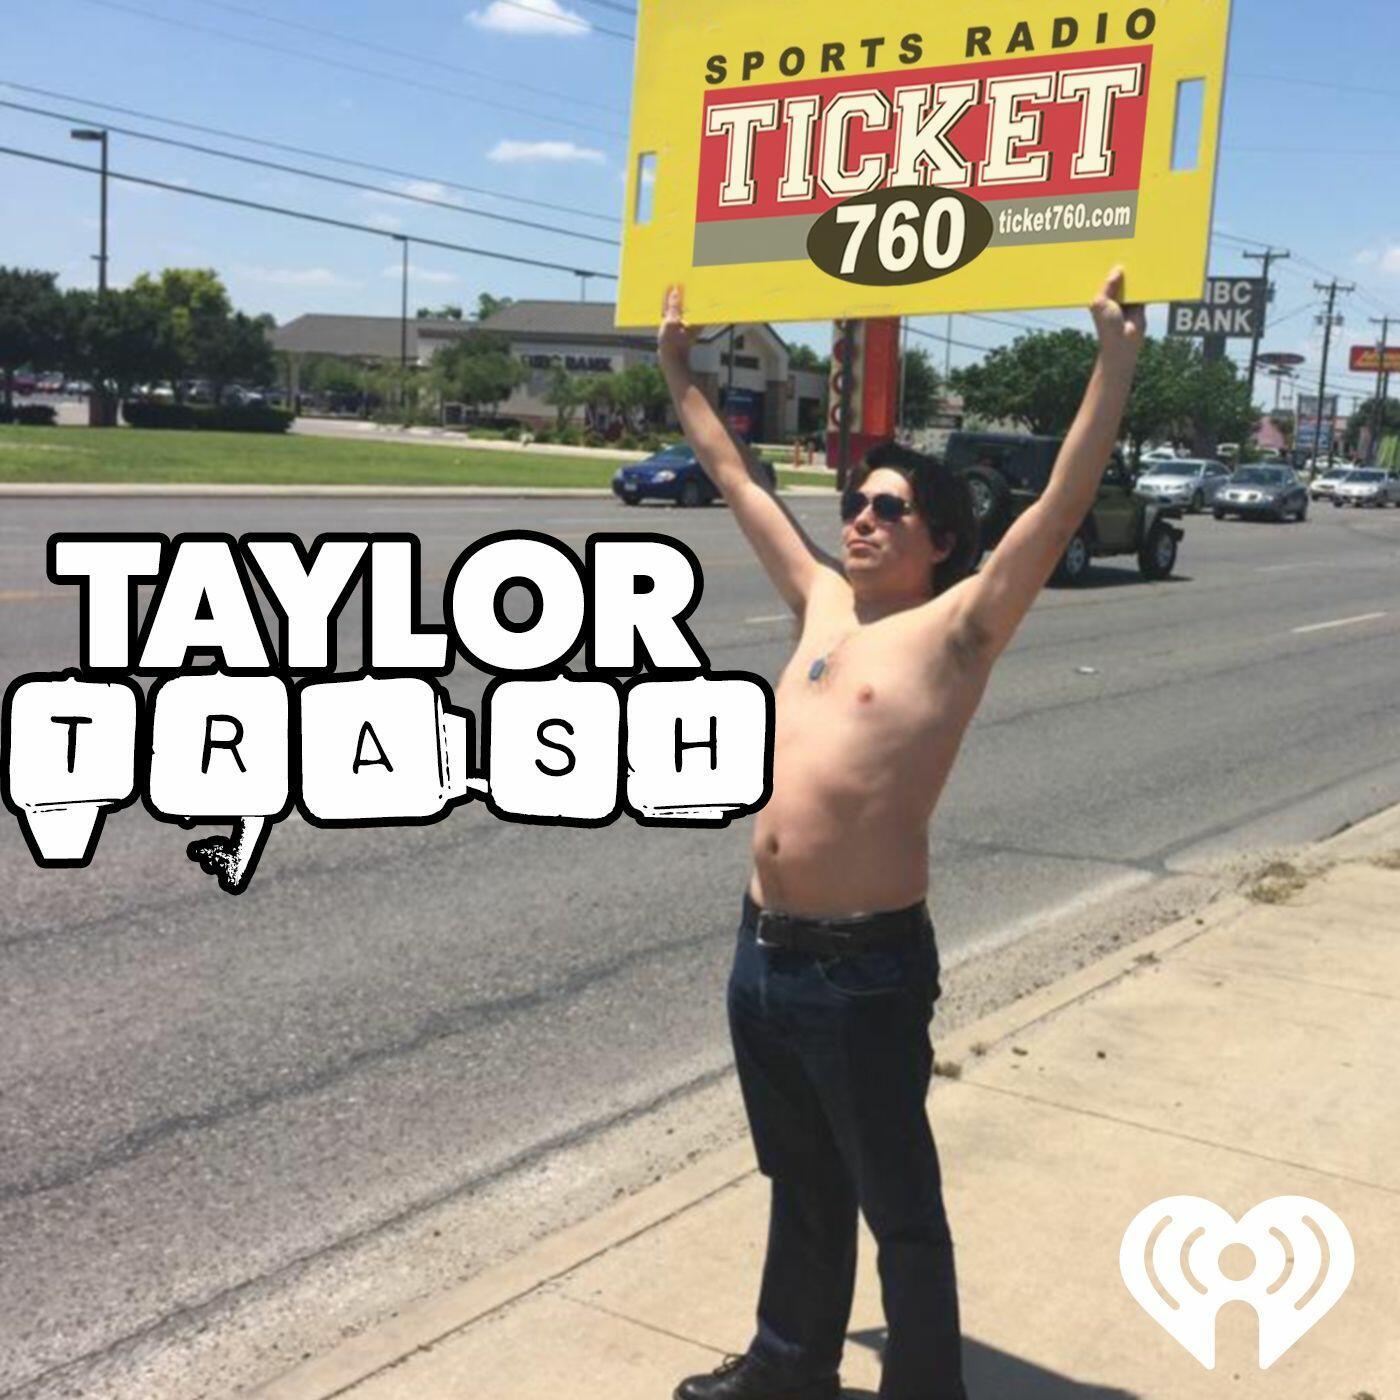 Taylor Trash